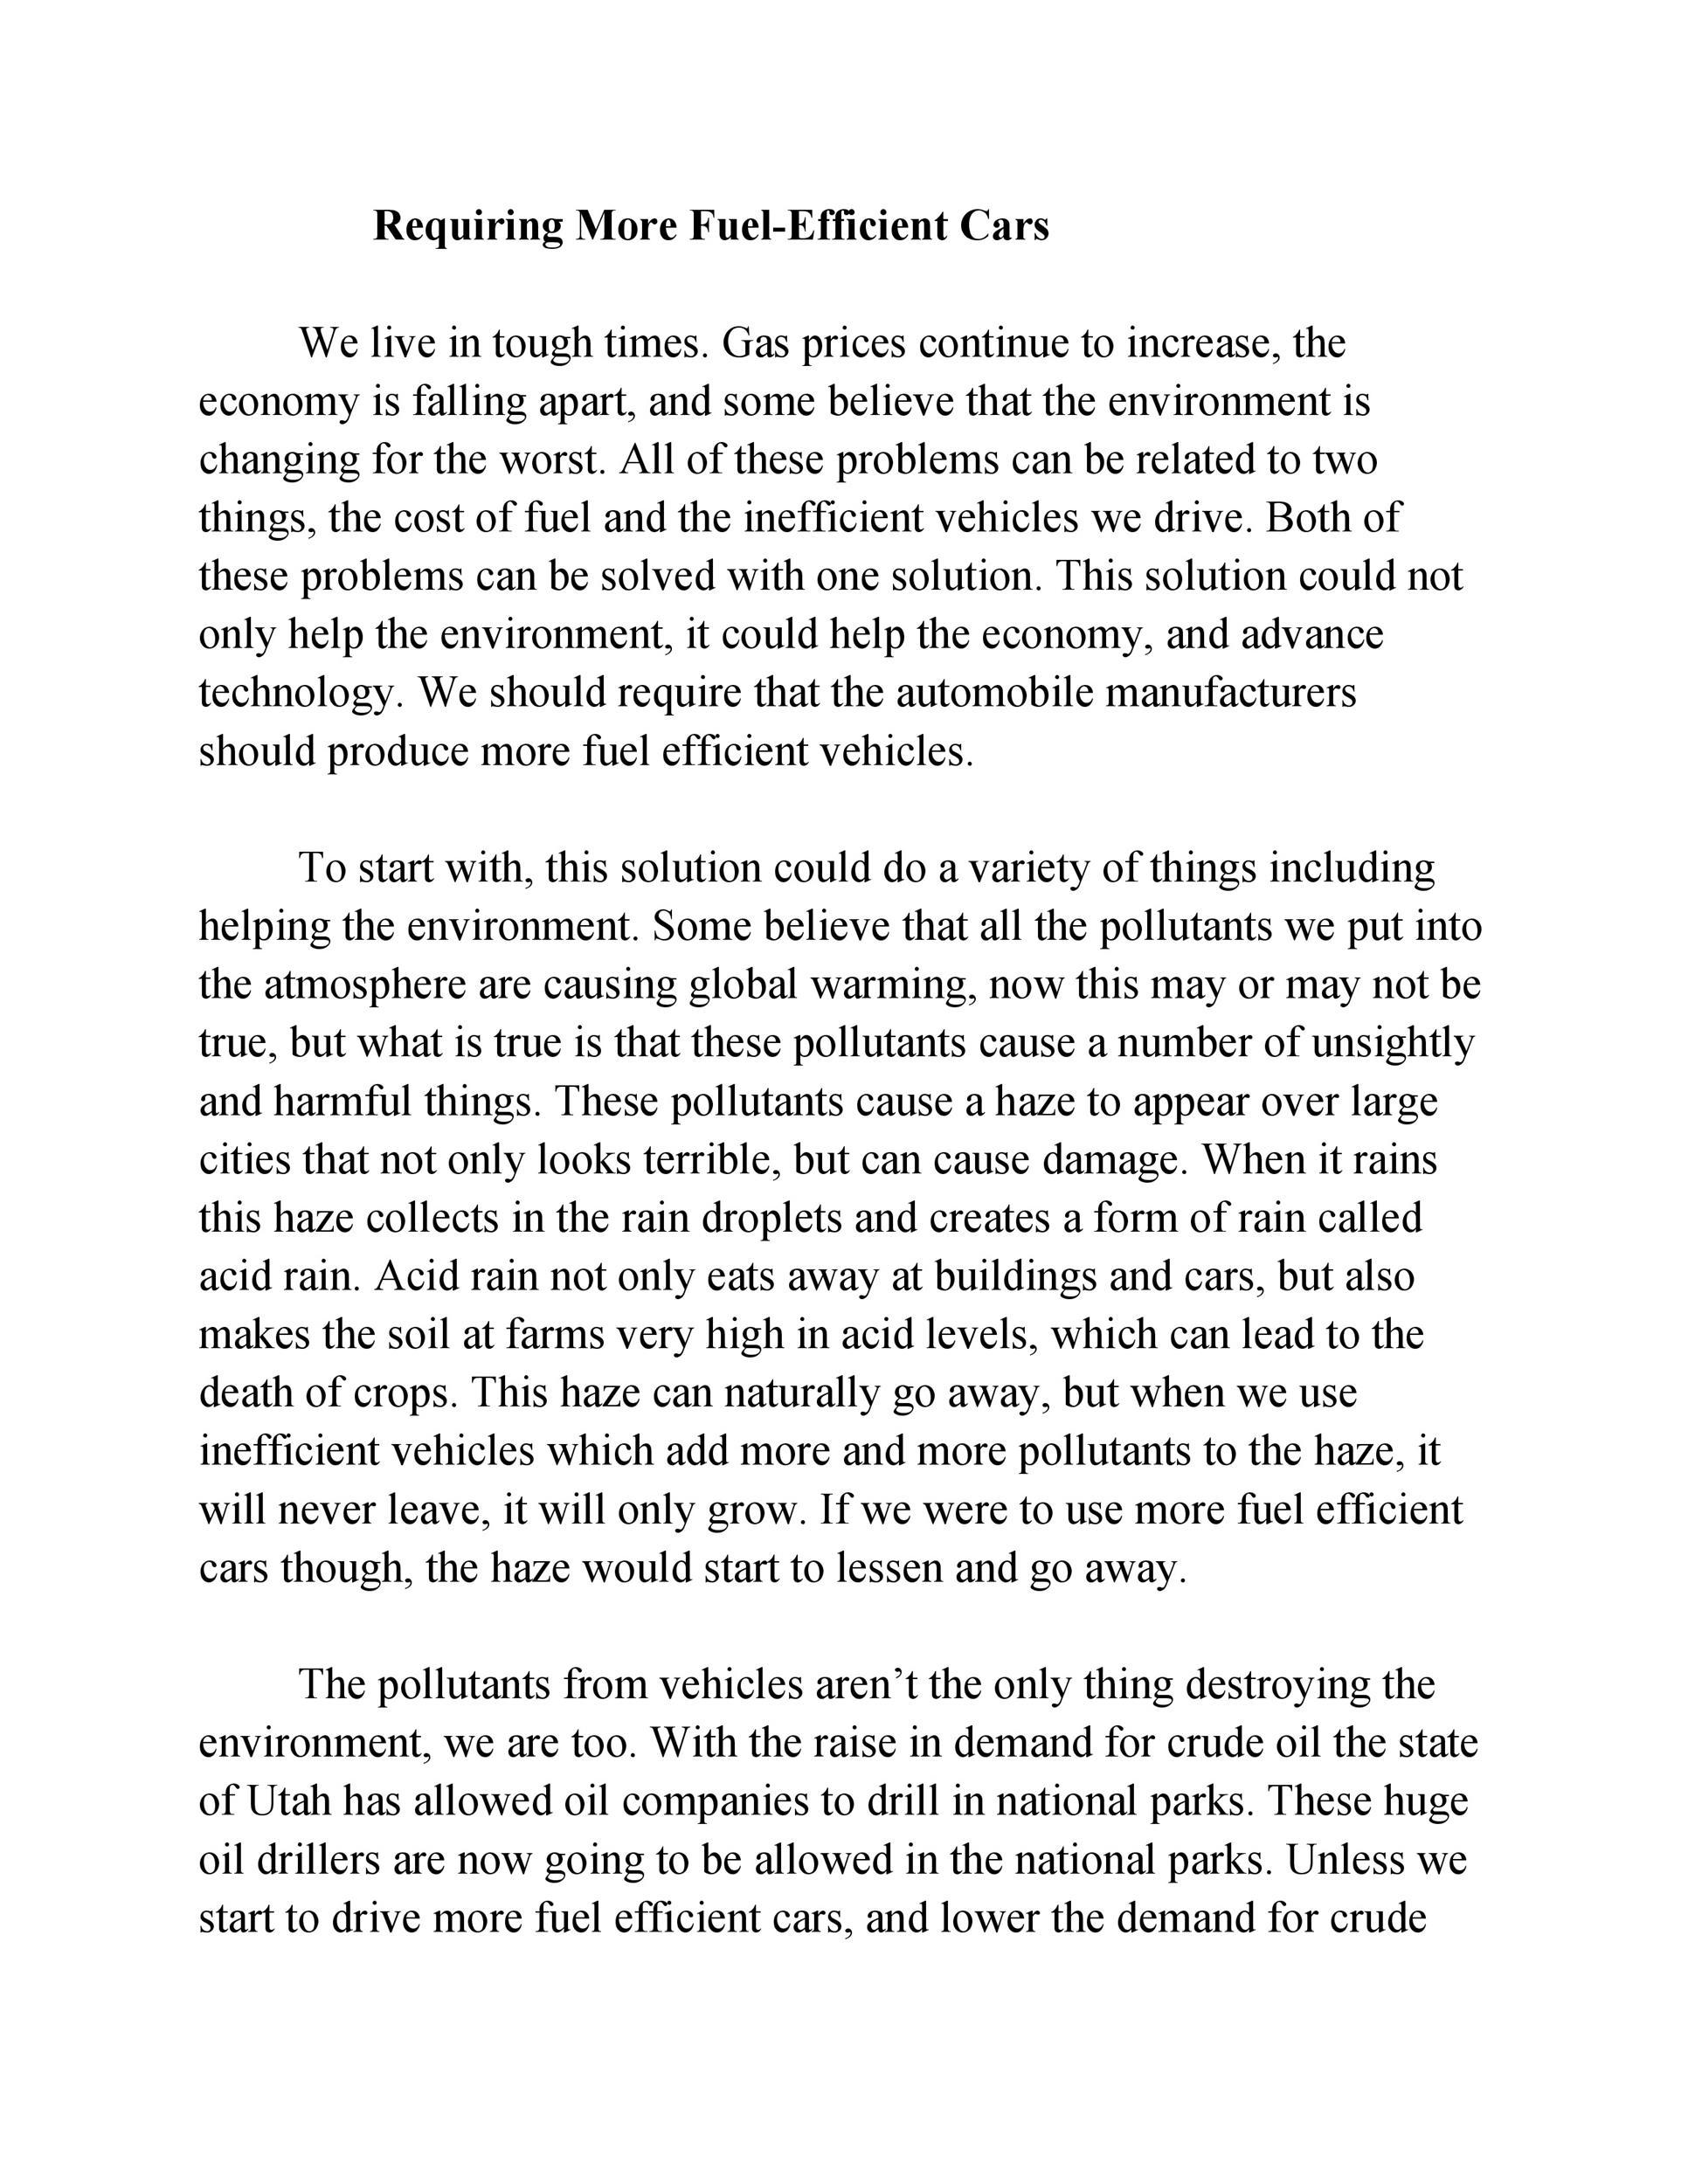 Free persuasive essay example 29